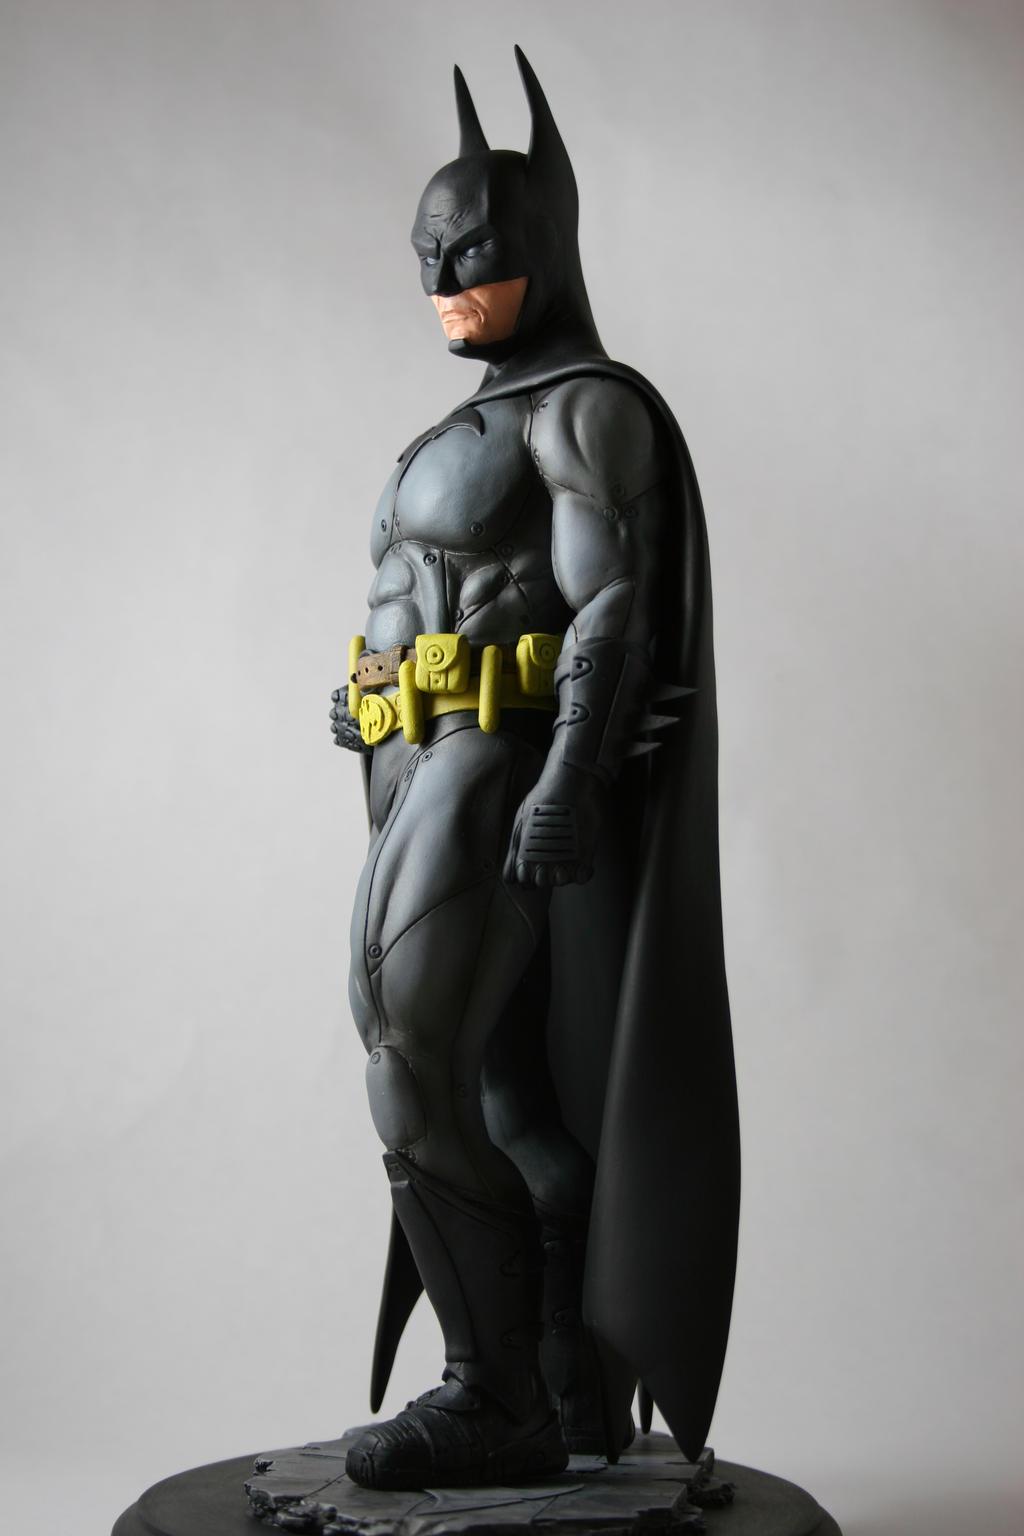 The Batman 3 by Spanglerart